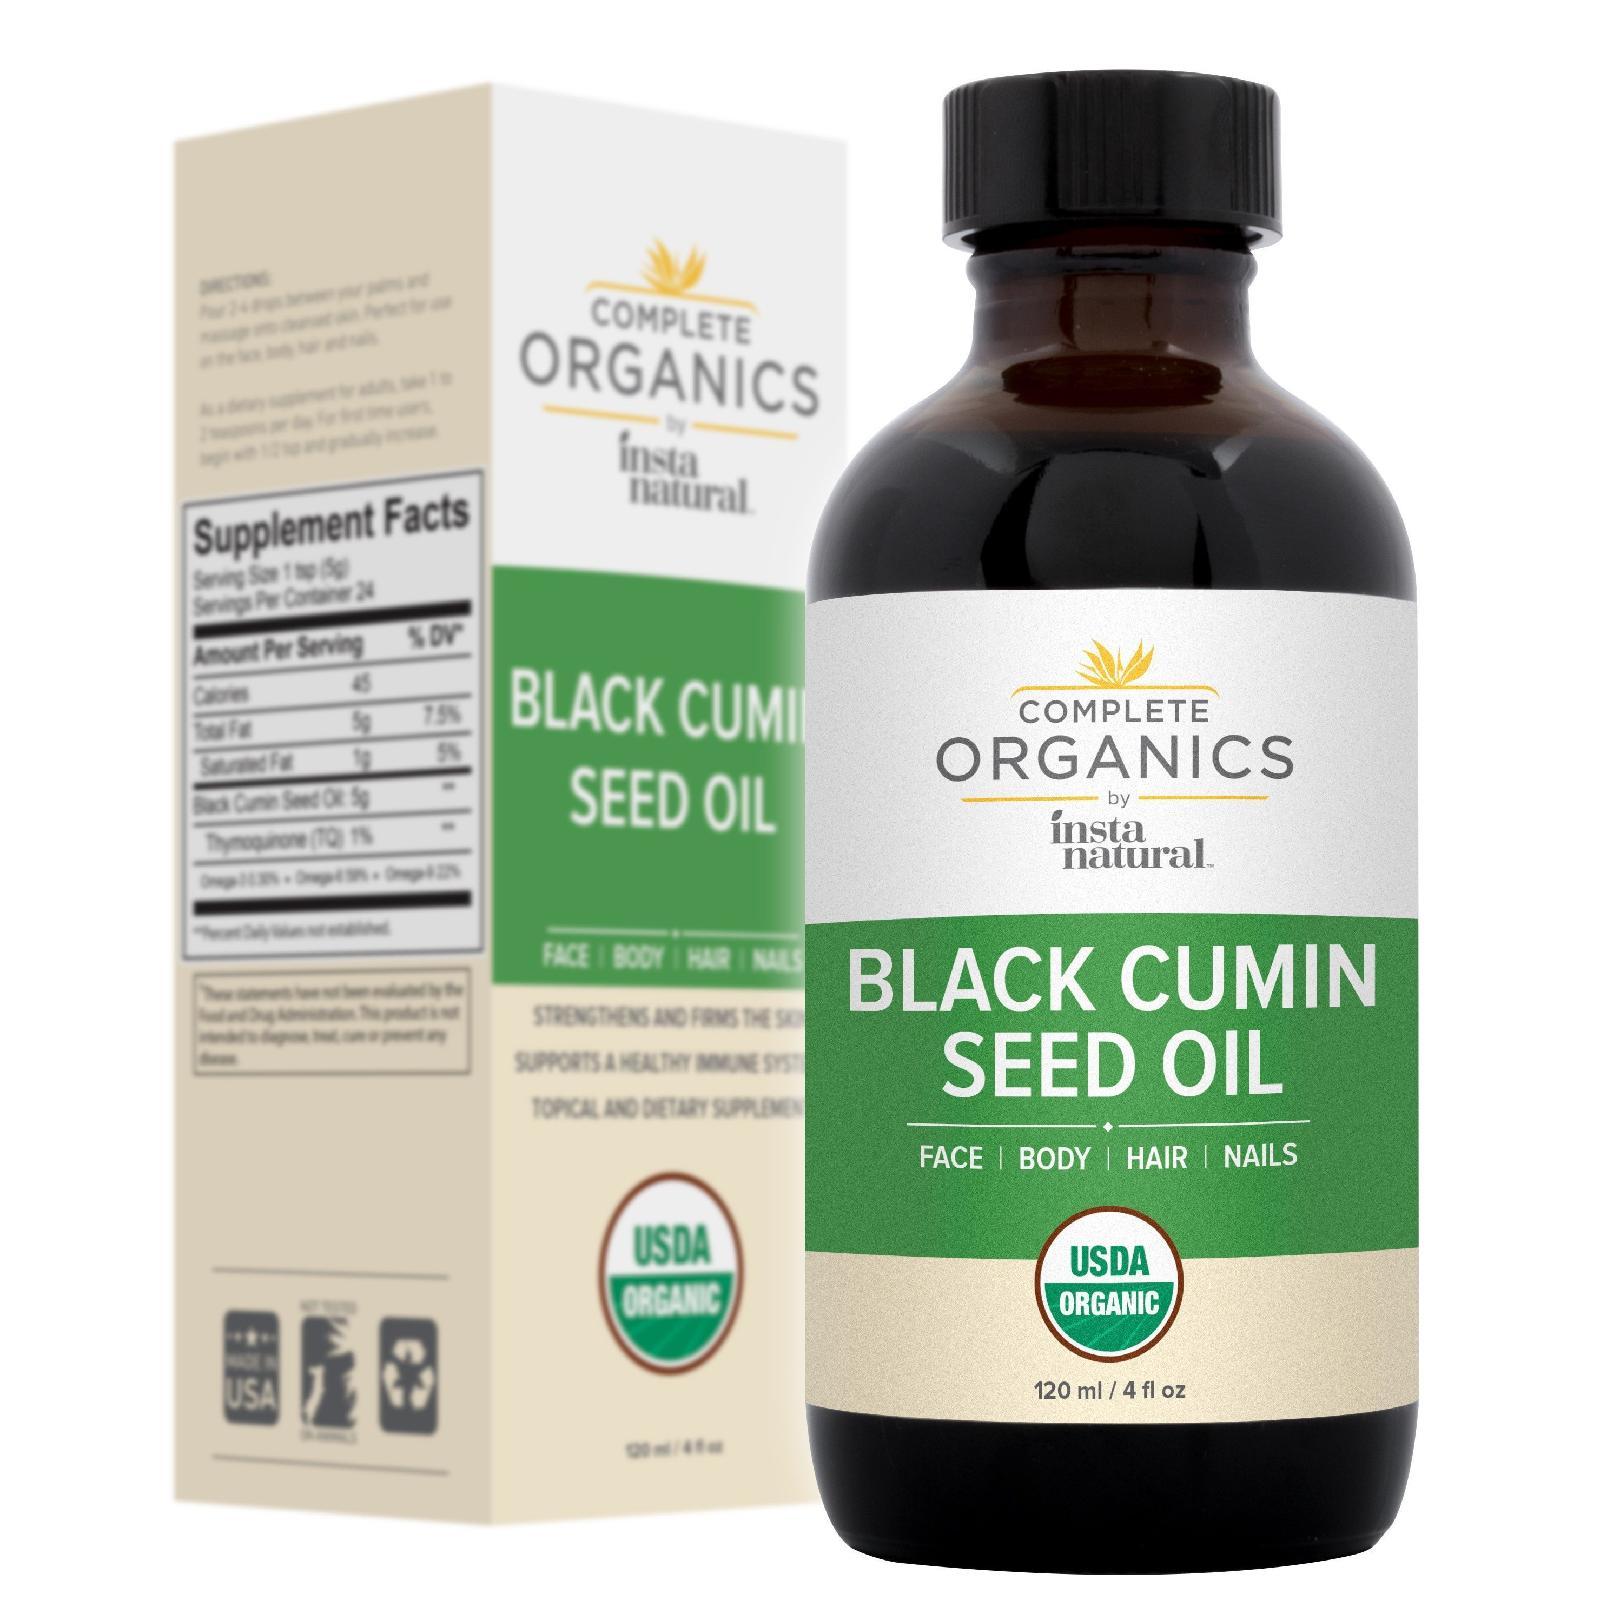 Complete Organics - Organic Black Cumin Seed Oil